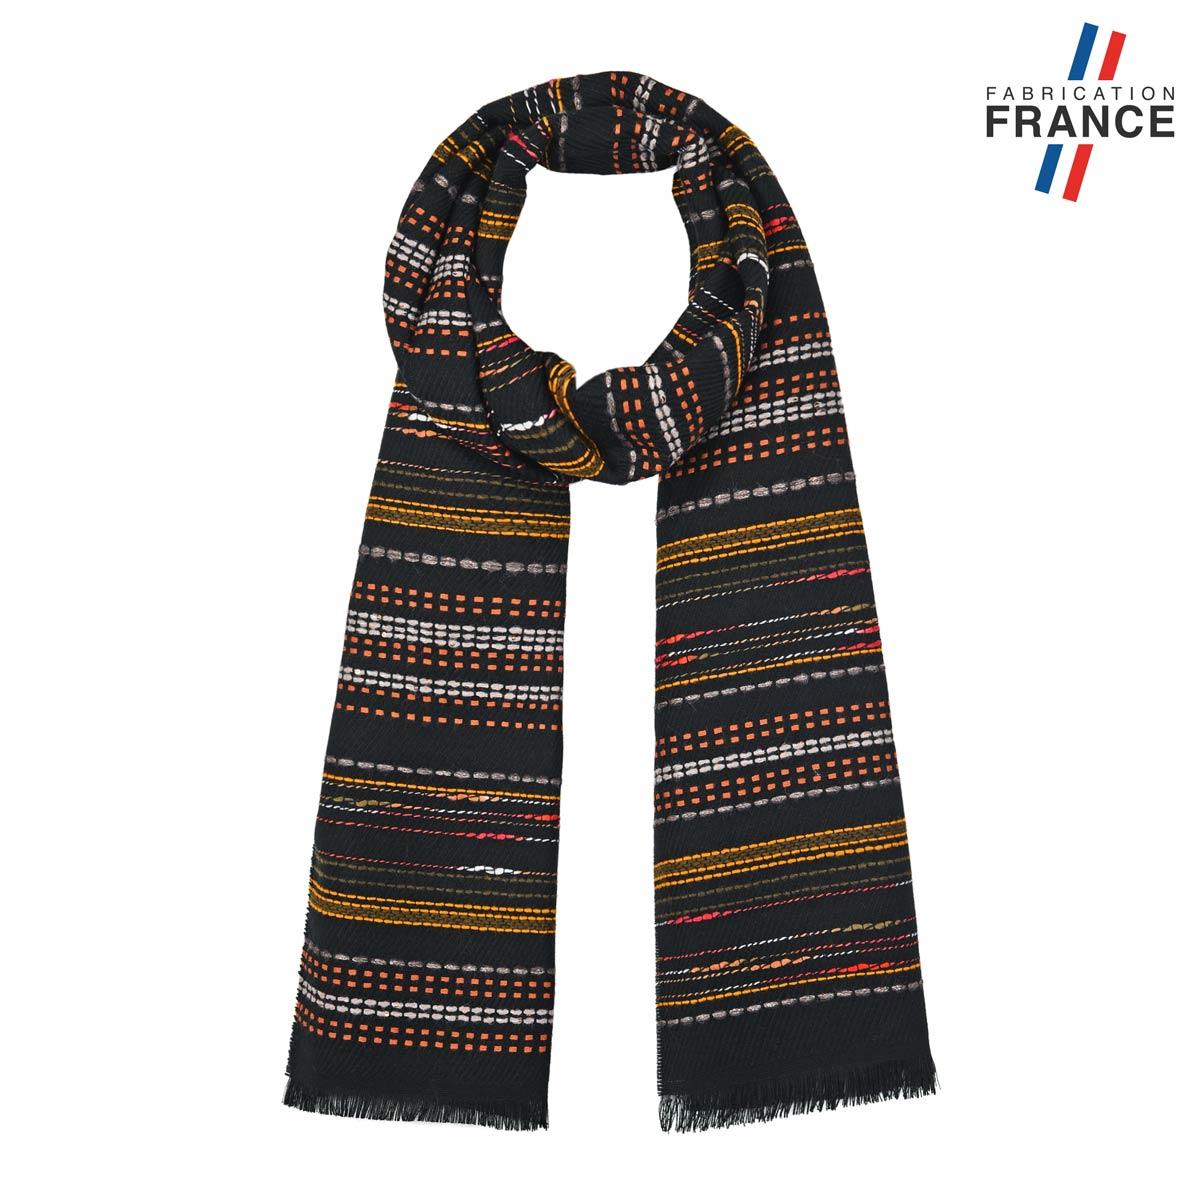 AT-05810_F12-1FR_Echapre-graphique-noire-beige-made-in-france